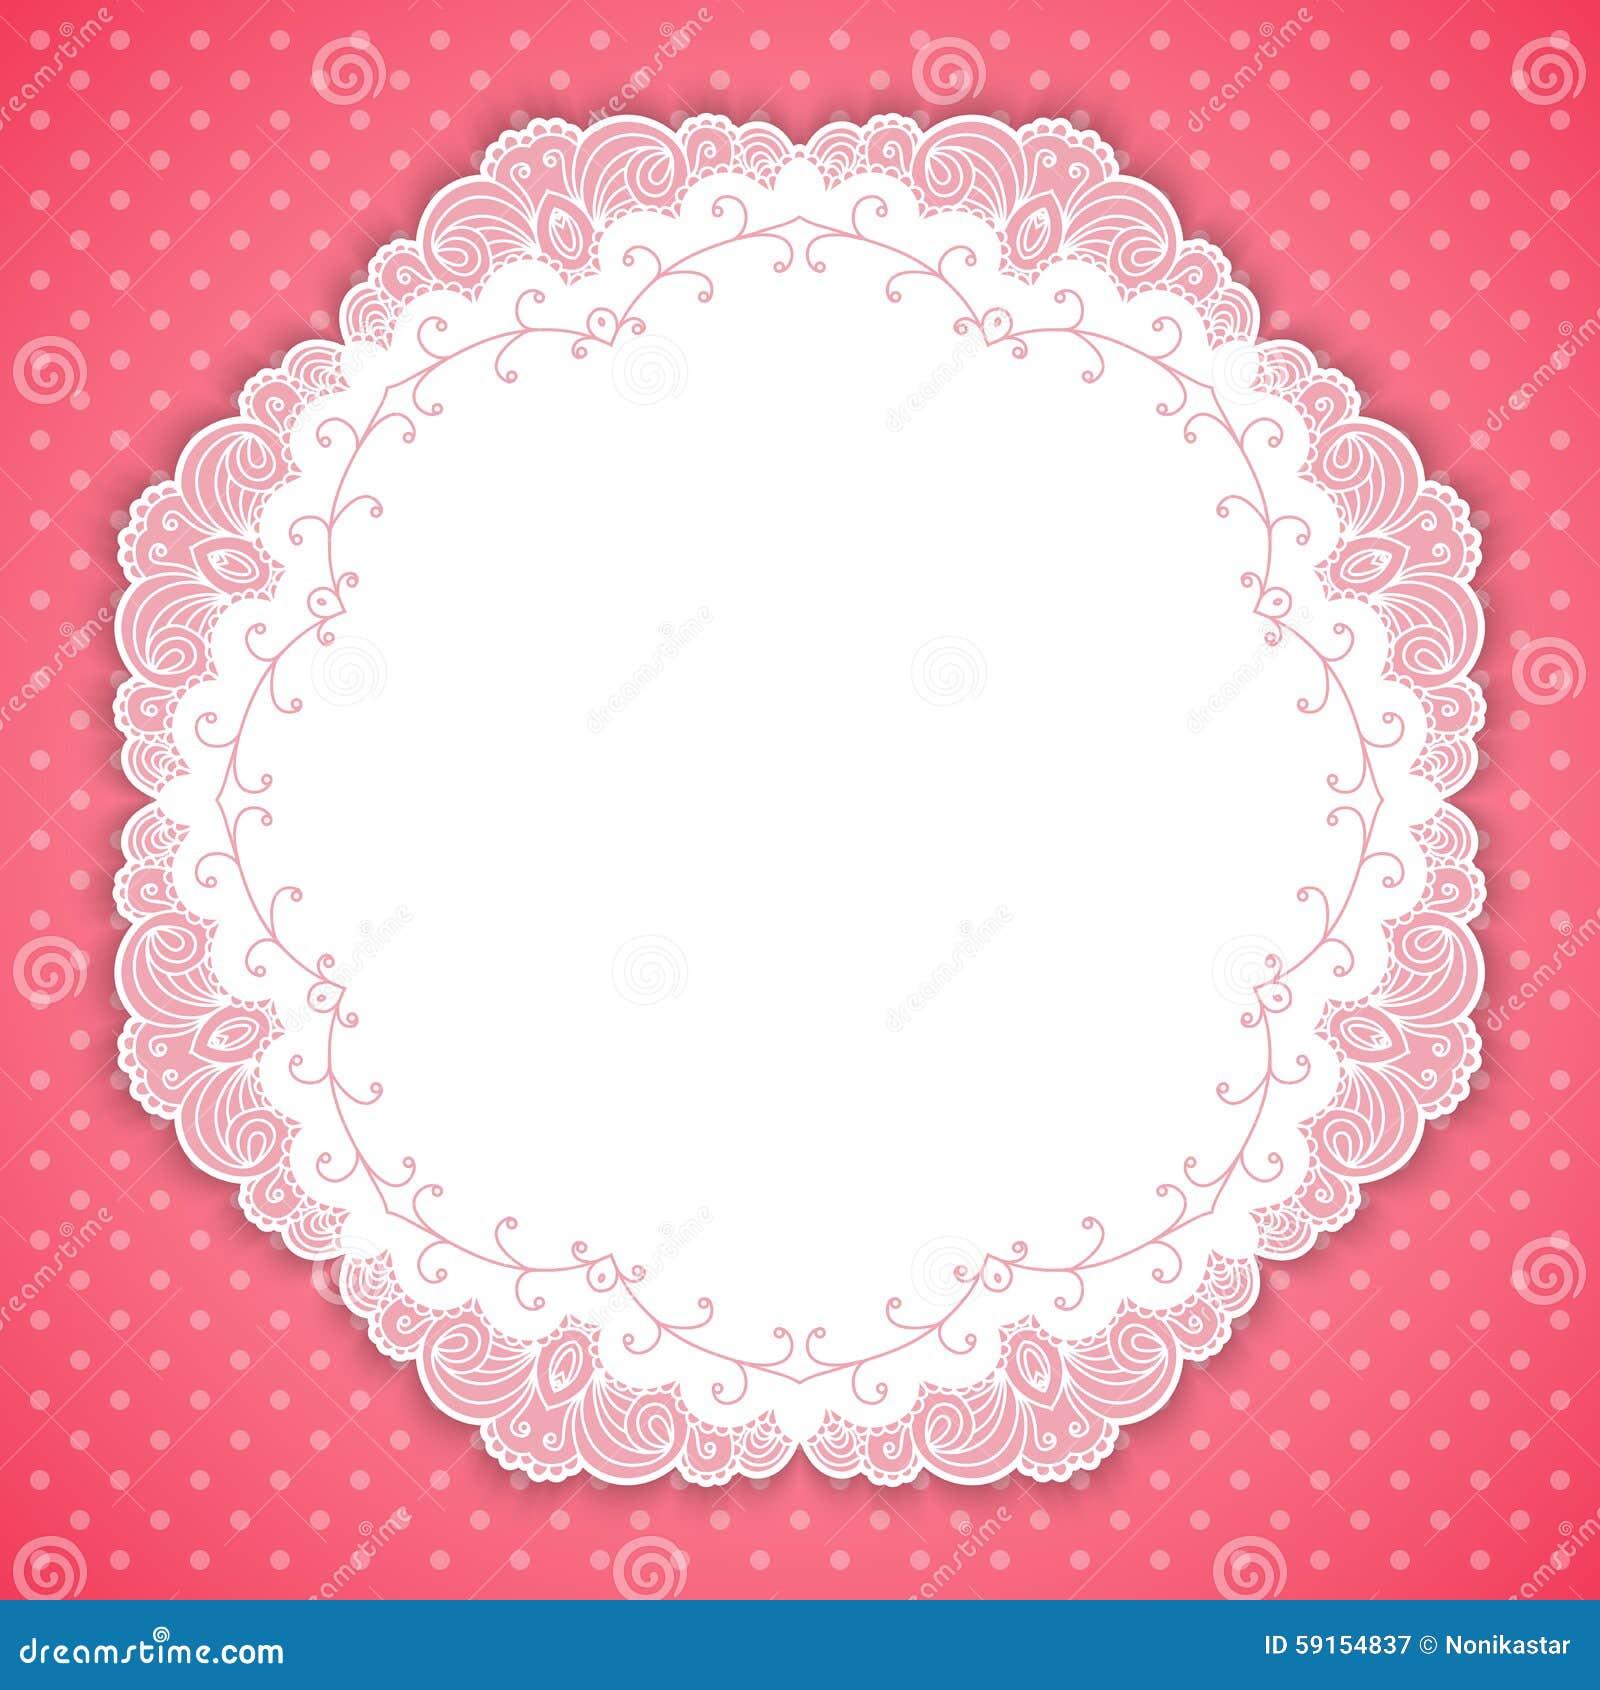 Pink Polka Dot Invitations was perfect invitations layout